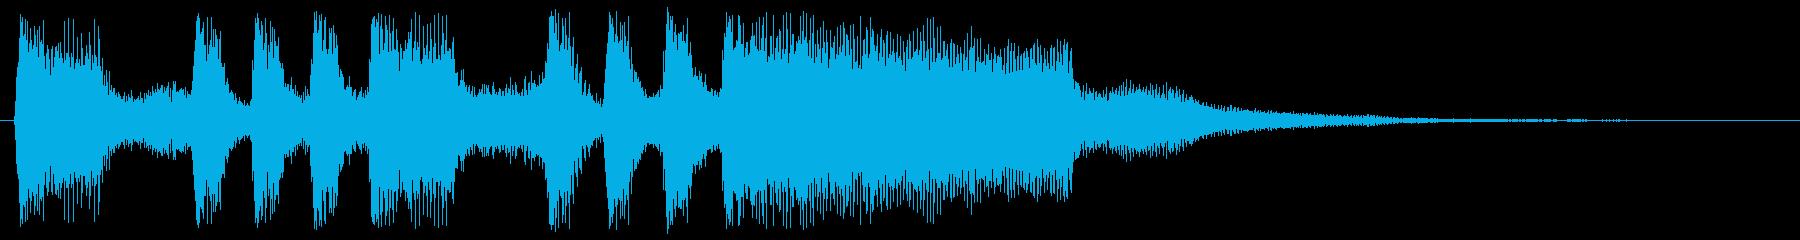 8bitなゲームクリア 達成 勝利の再生済みの波形